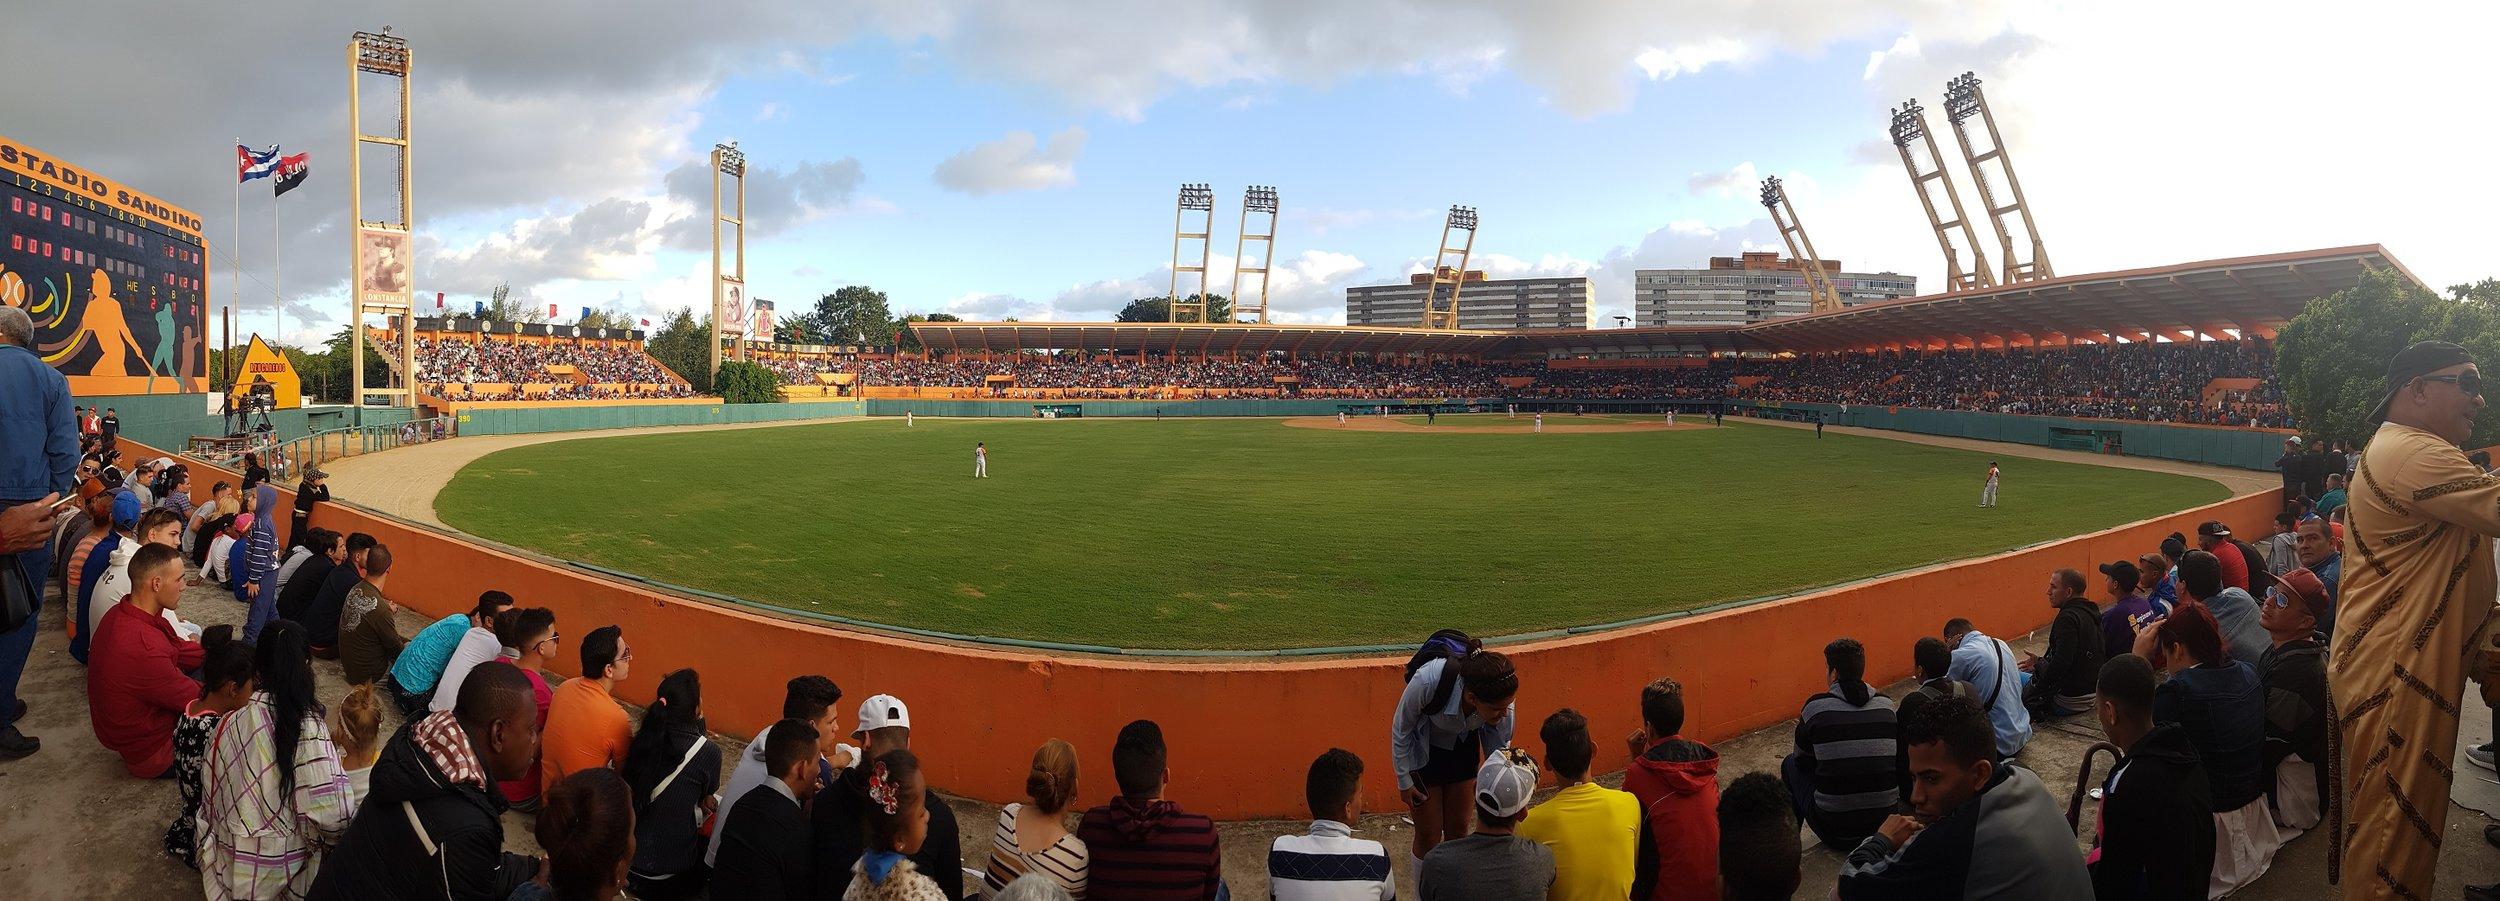 Santa Rosa Baseball Stadium